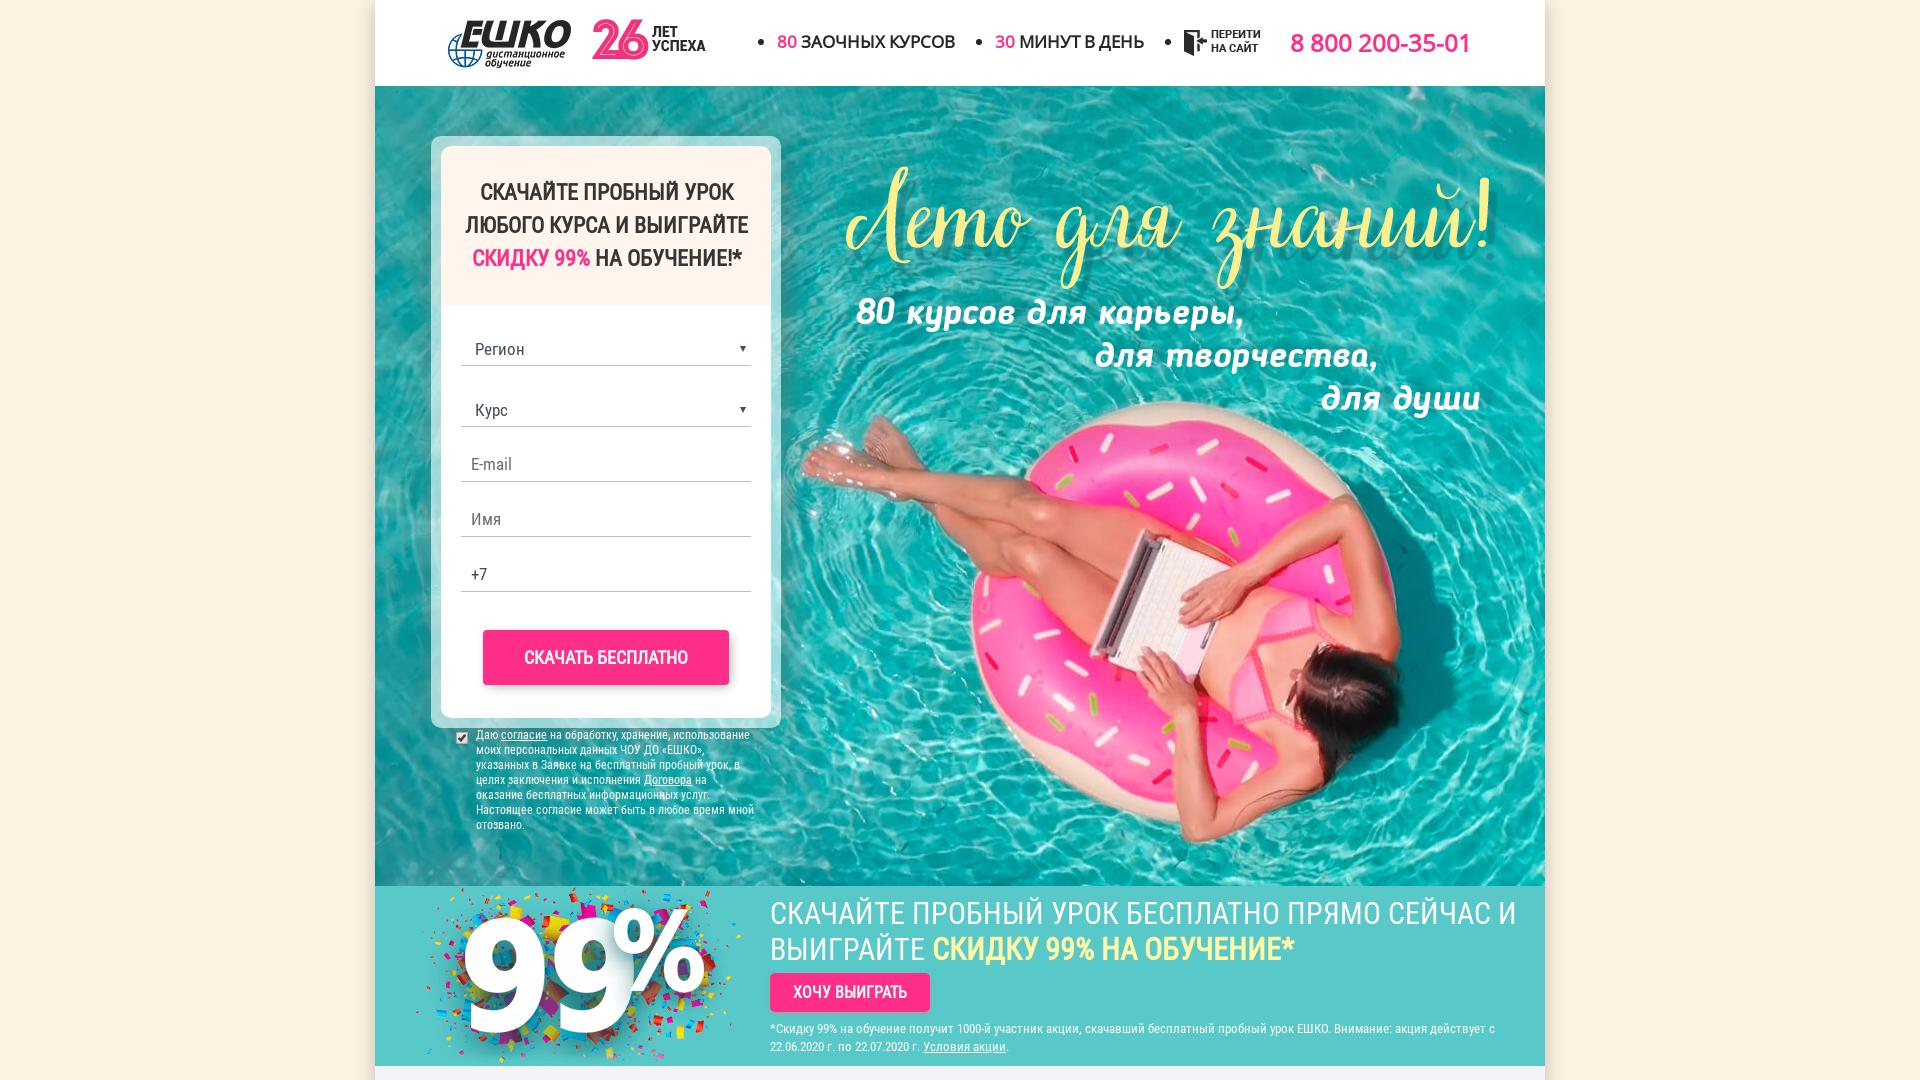 ЕШКО website